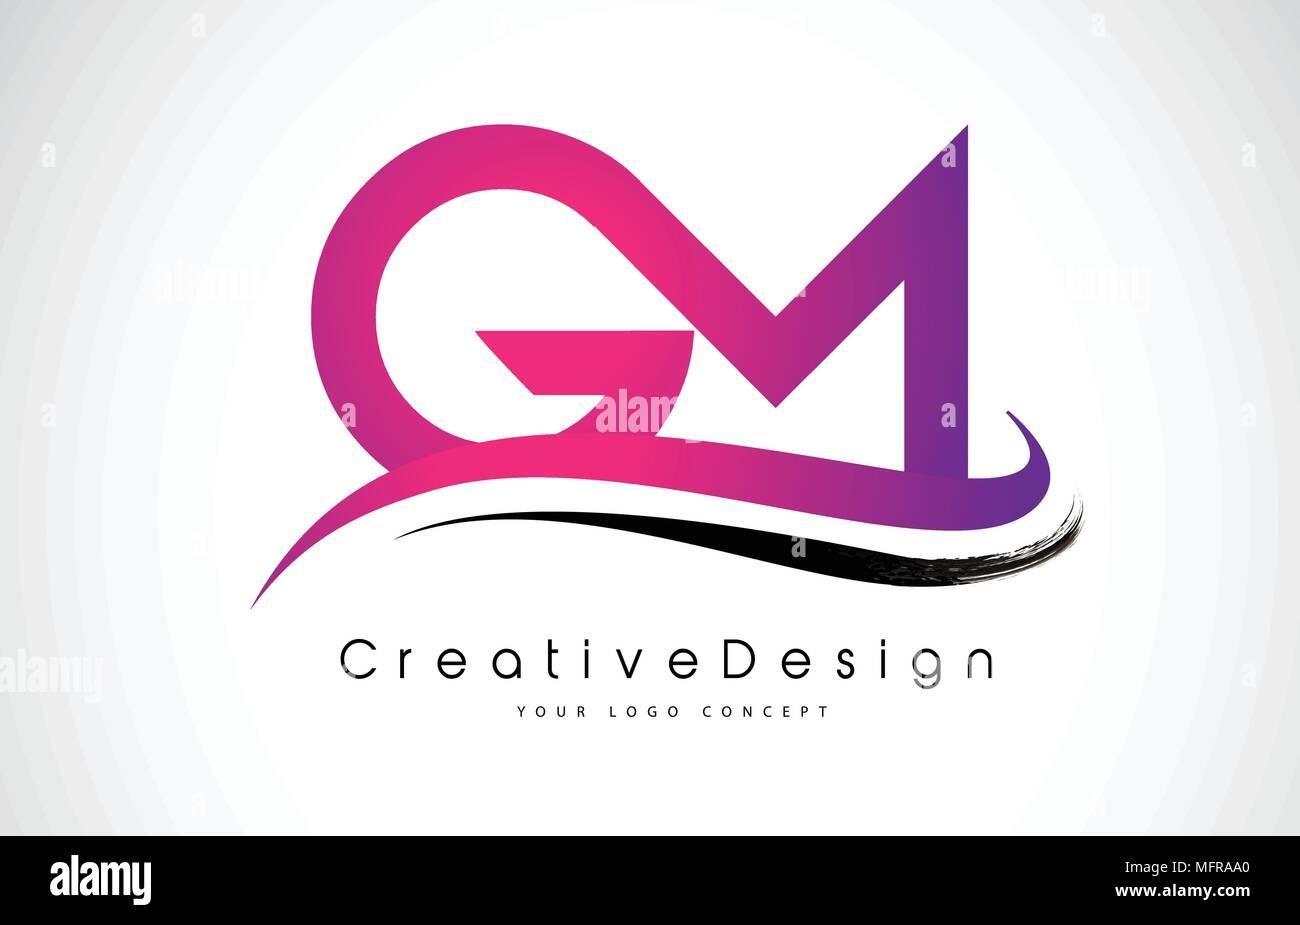 GM G M Letter Logo Design in Black Colors. Creative Modern Letters ...